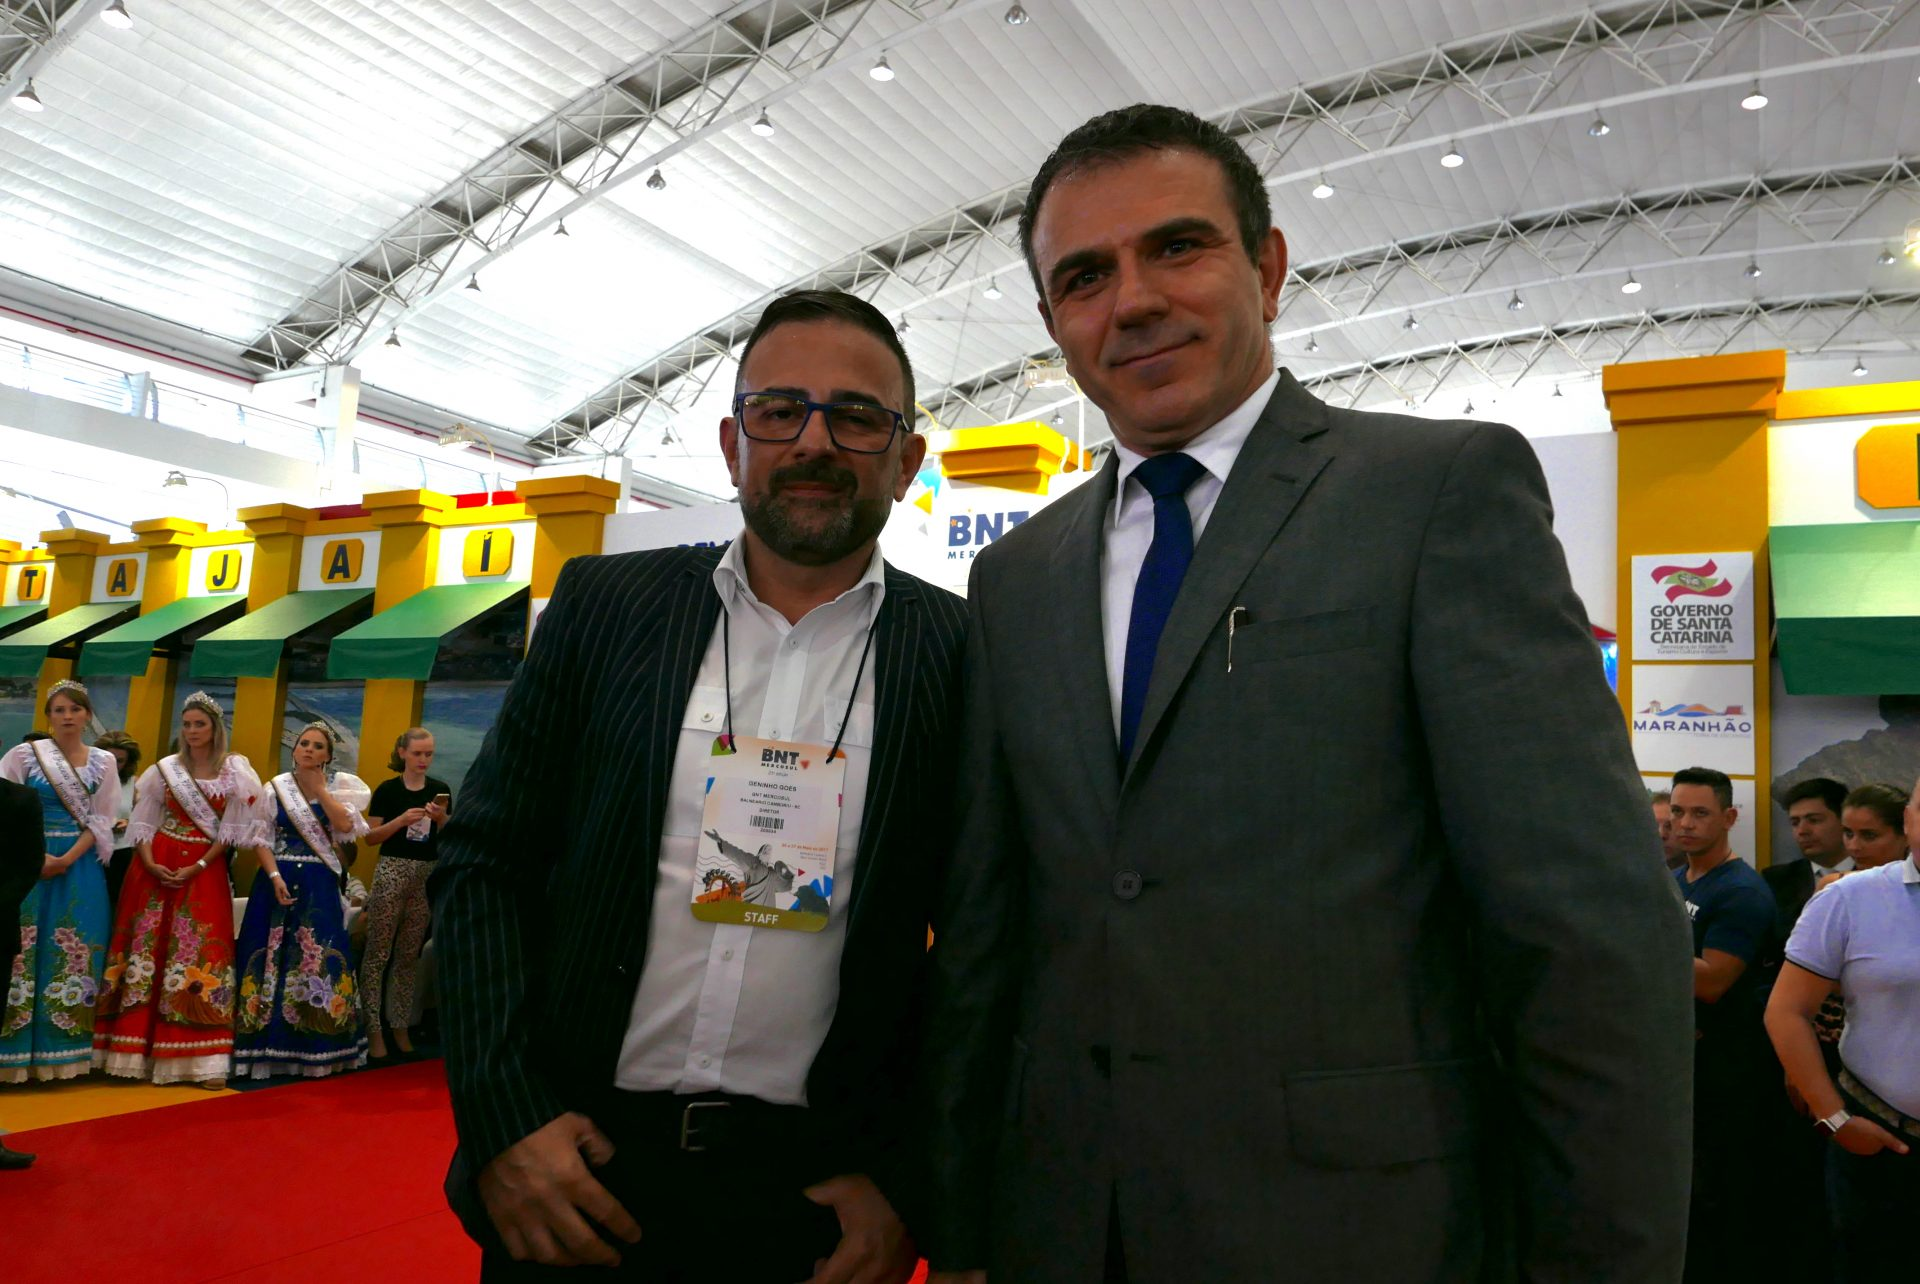 Geninho Goes e Jair Pasquini, da BNT Mercosul